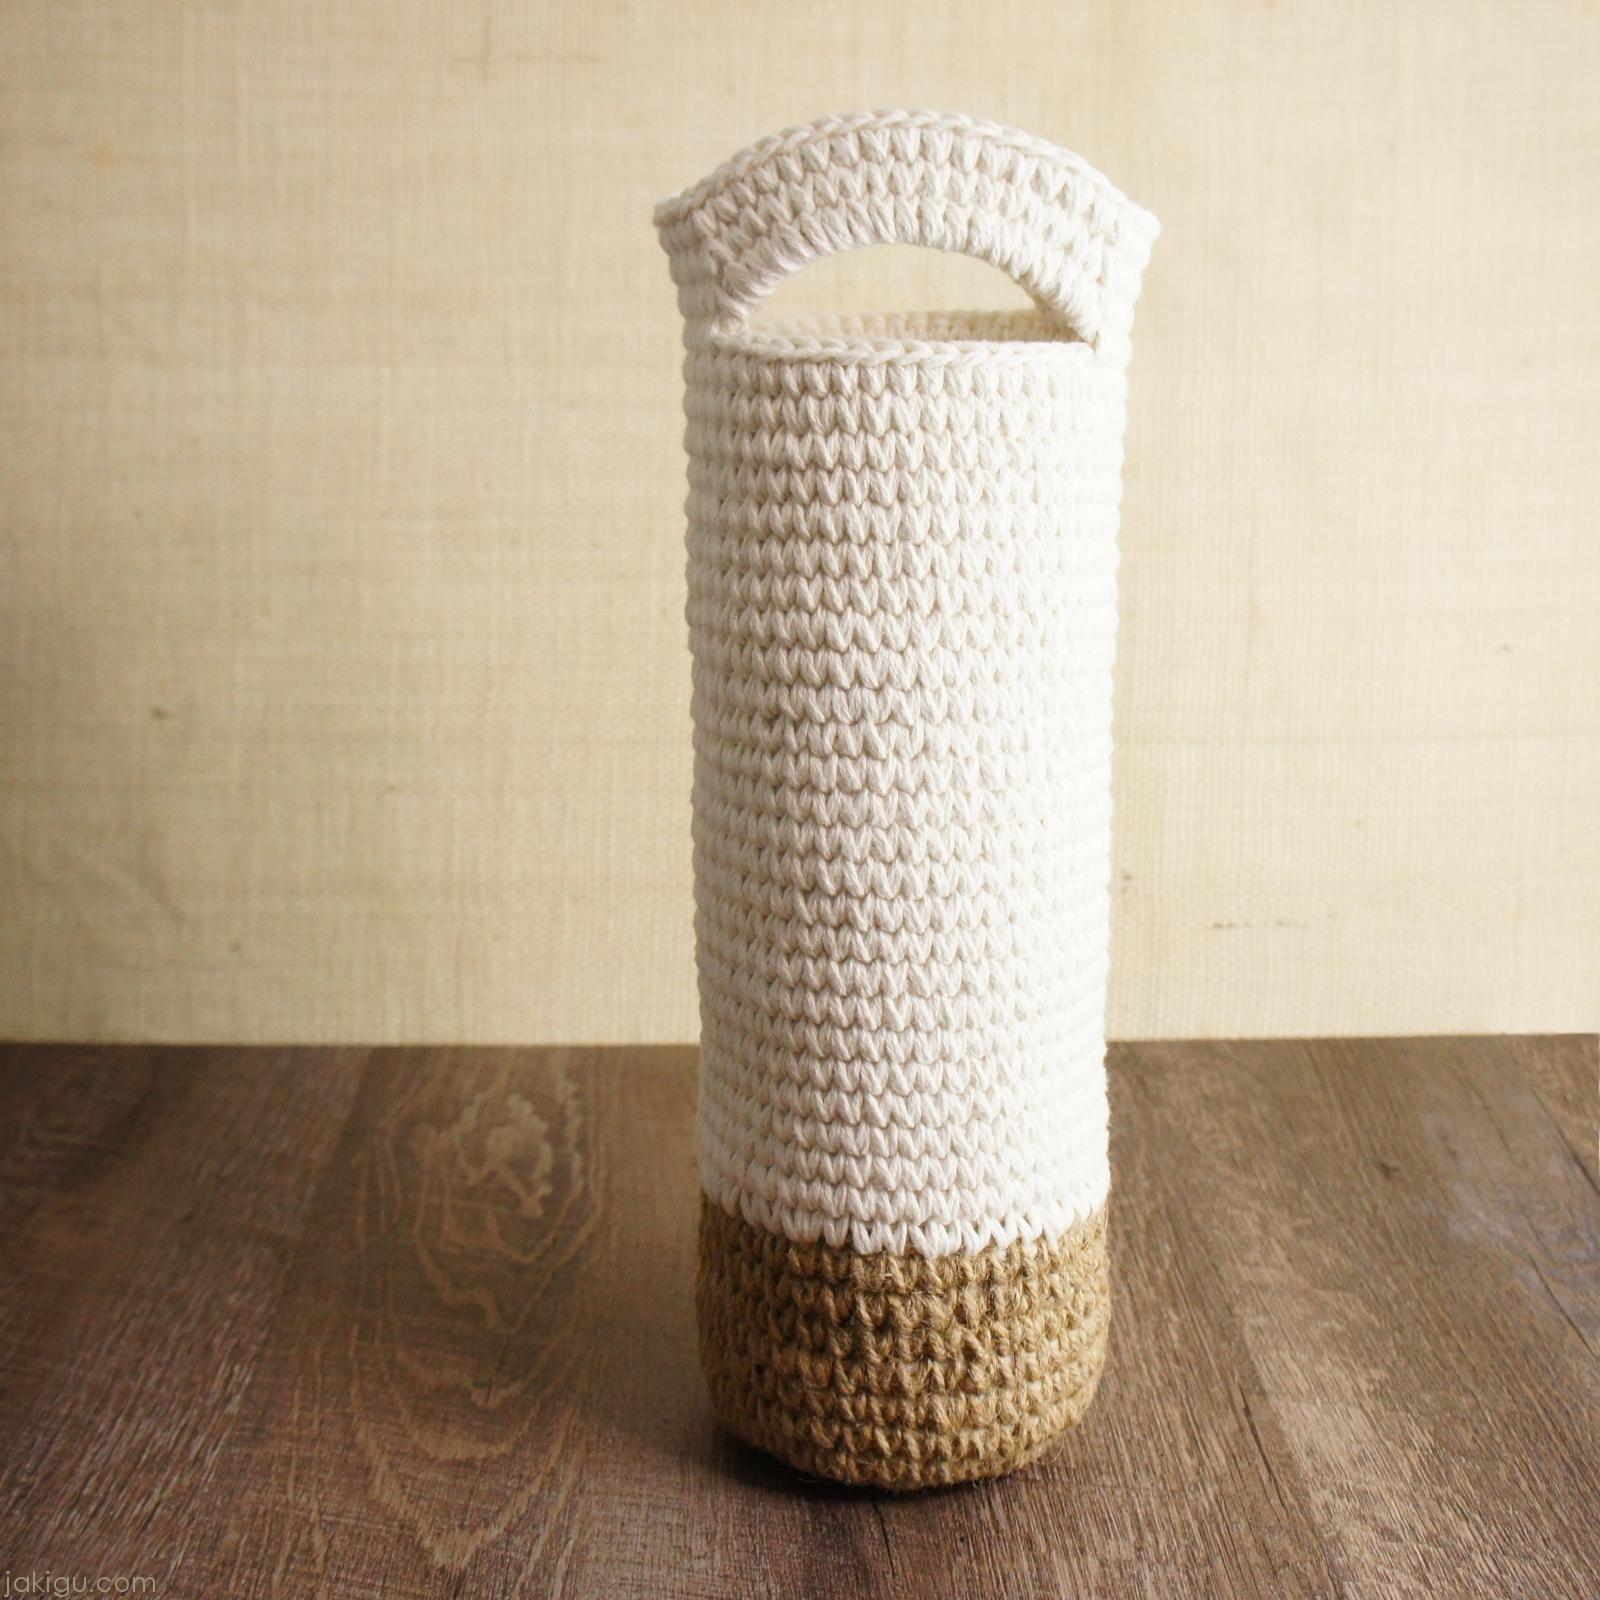 Jute and Cotton Wine Bag | | jakigu.com crochet pattern